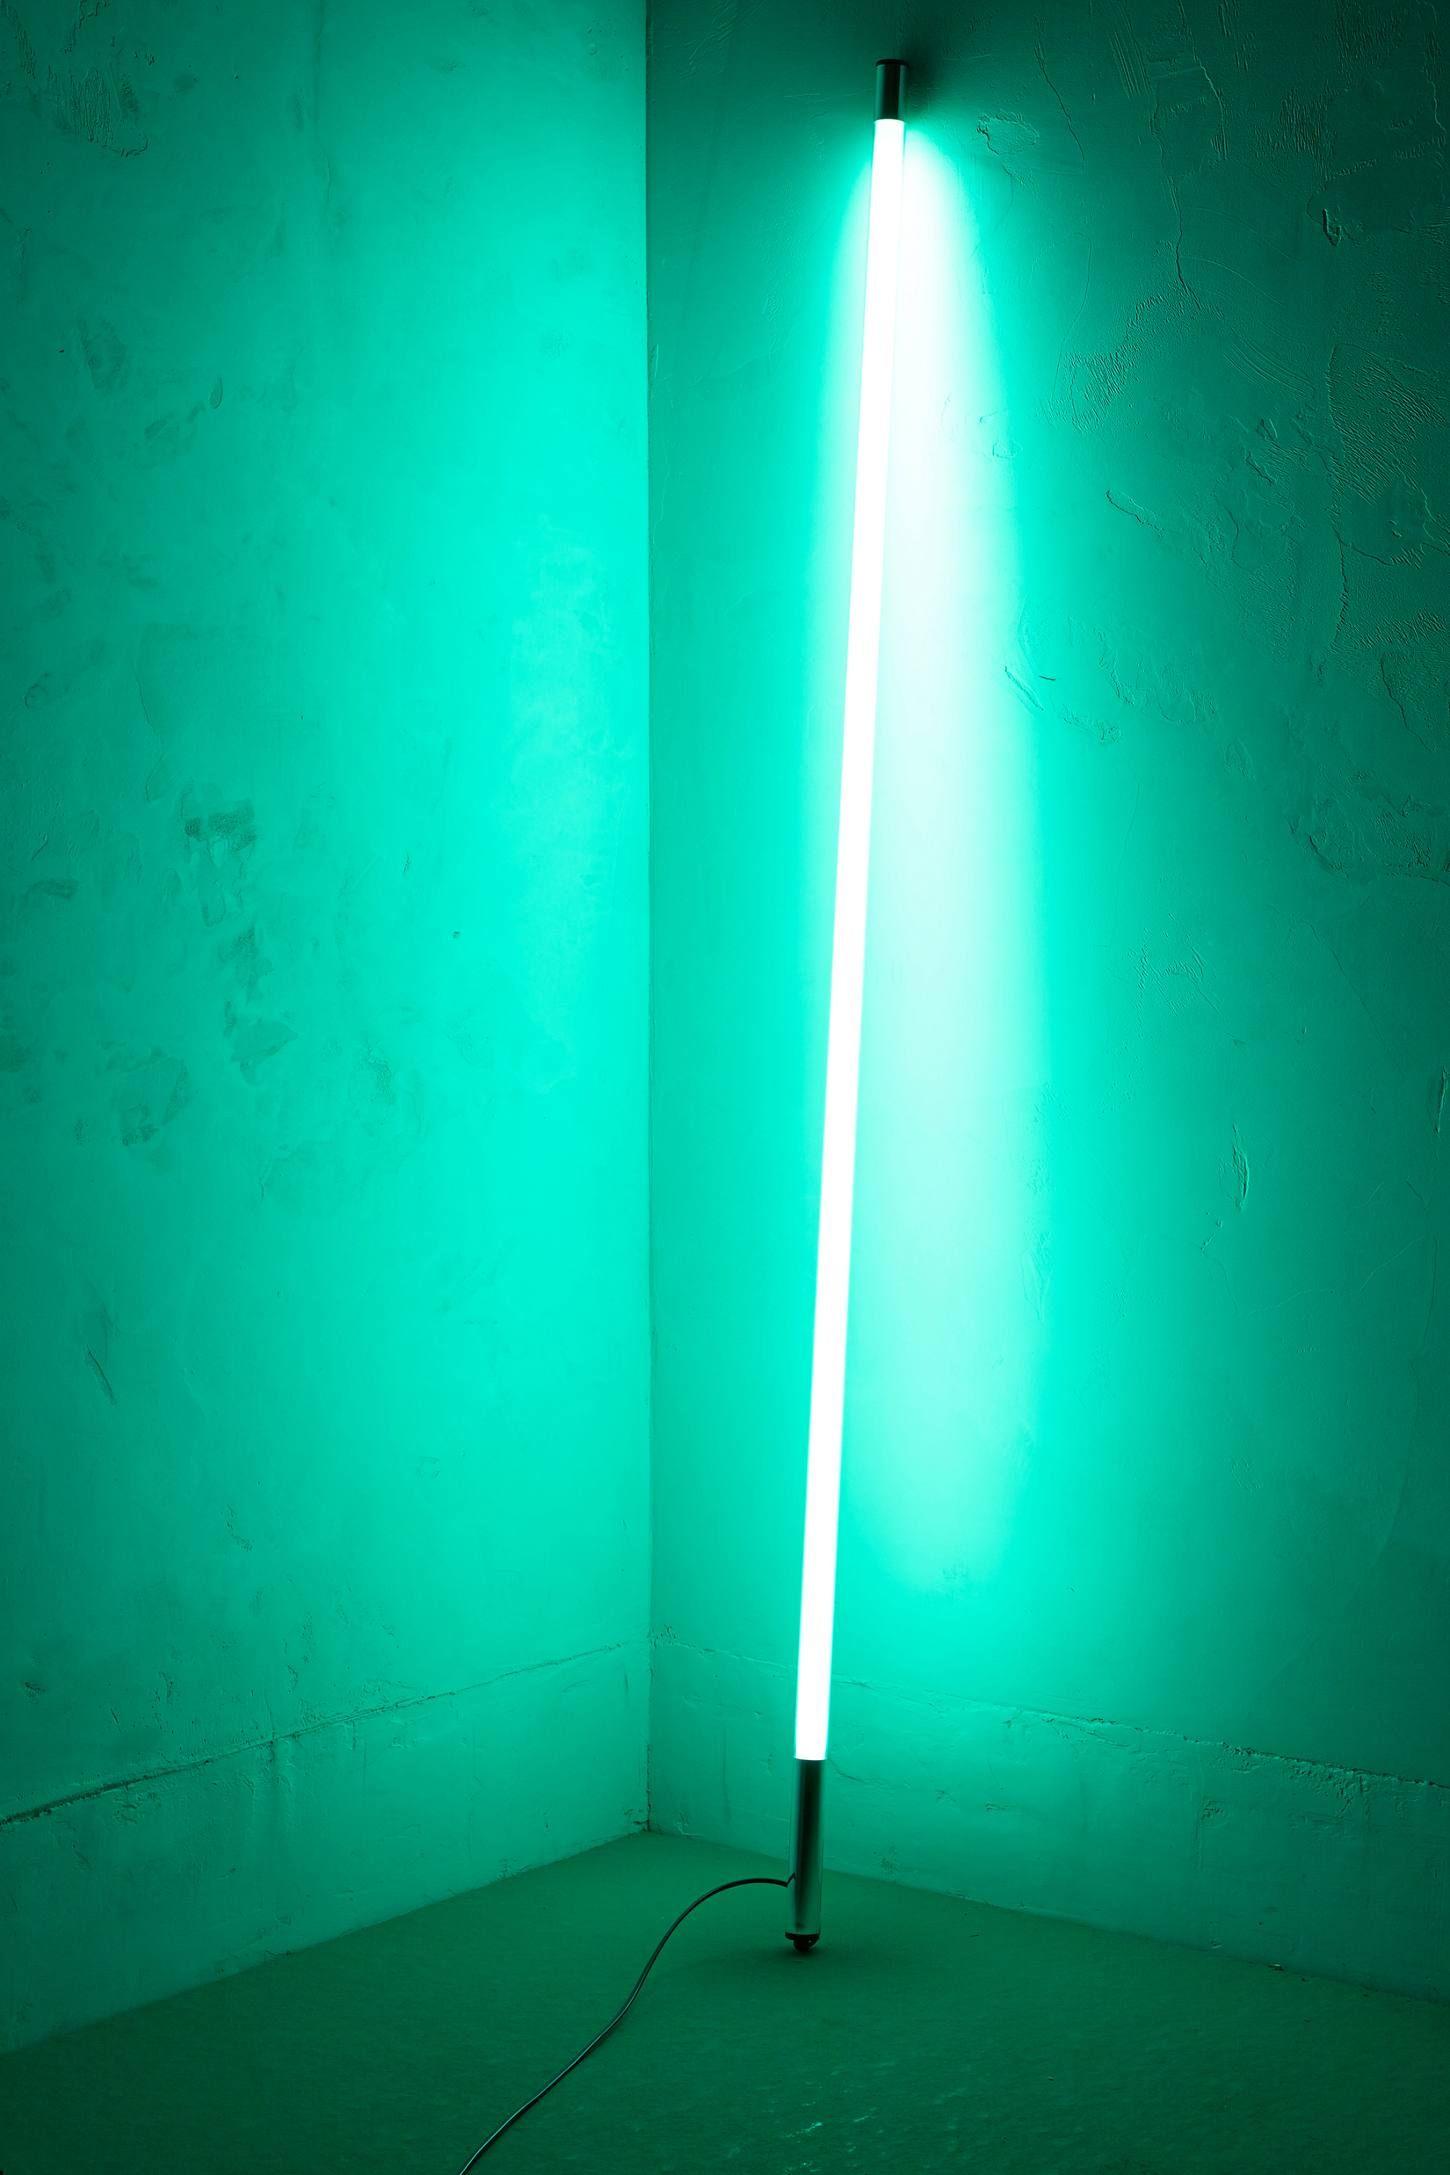 neon light stick lights anthropologie lighting sticks lightsaber lamp nights well william mean verona shakespeare gentlemen machine